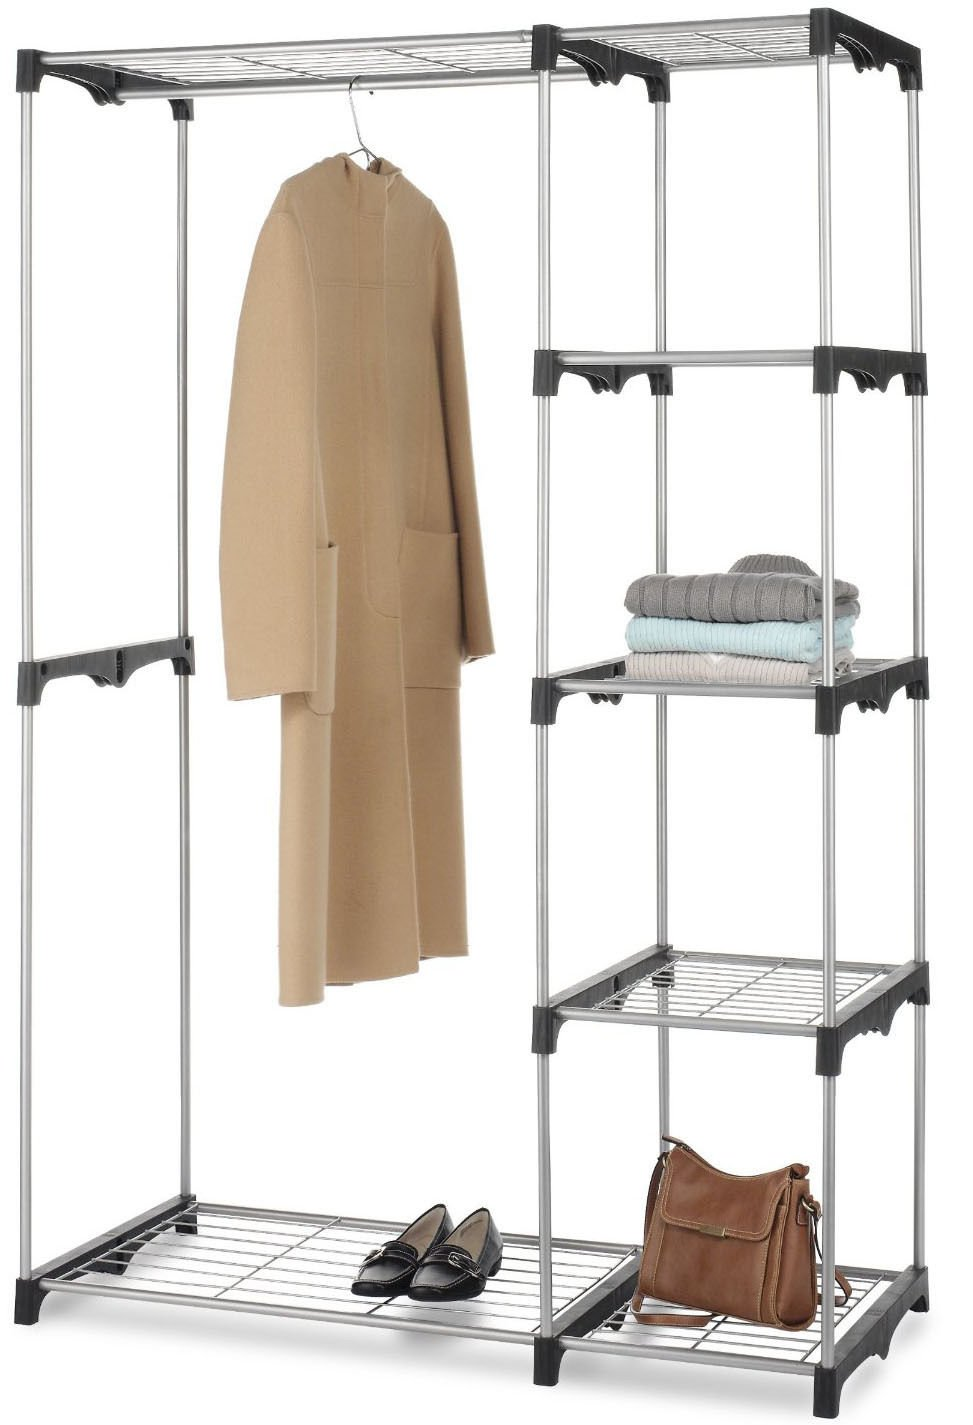 Amazon.com: Closet Organizer Storage Rack Portable Clothes Hanger Home  Garment Shelf Rod G68: Home U0026 Kitchen